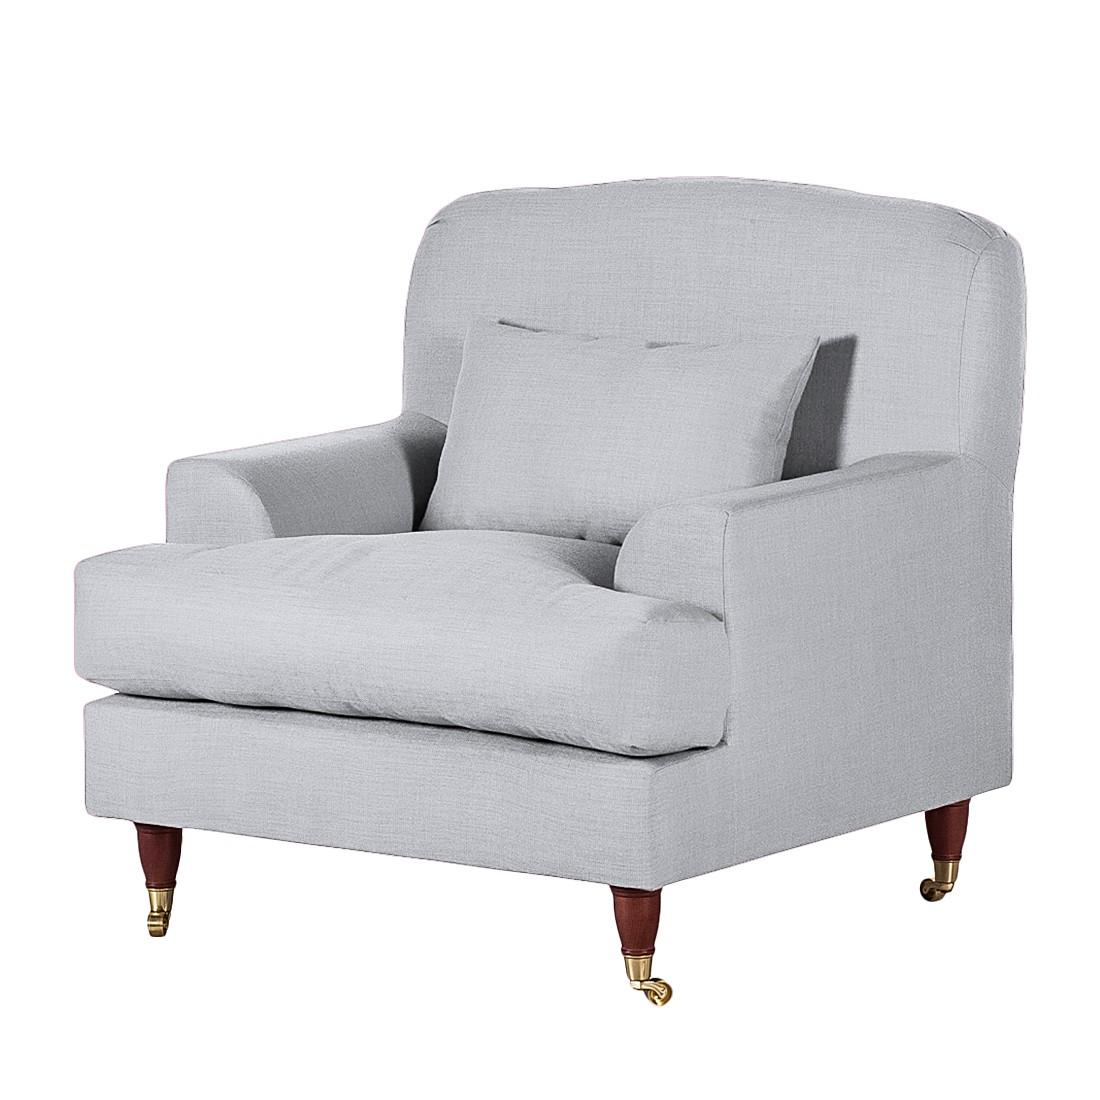 Sessel Bent – Webstoff Grau, Maison Belfort kaufen